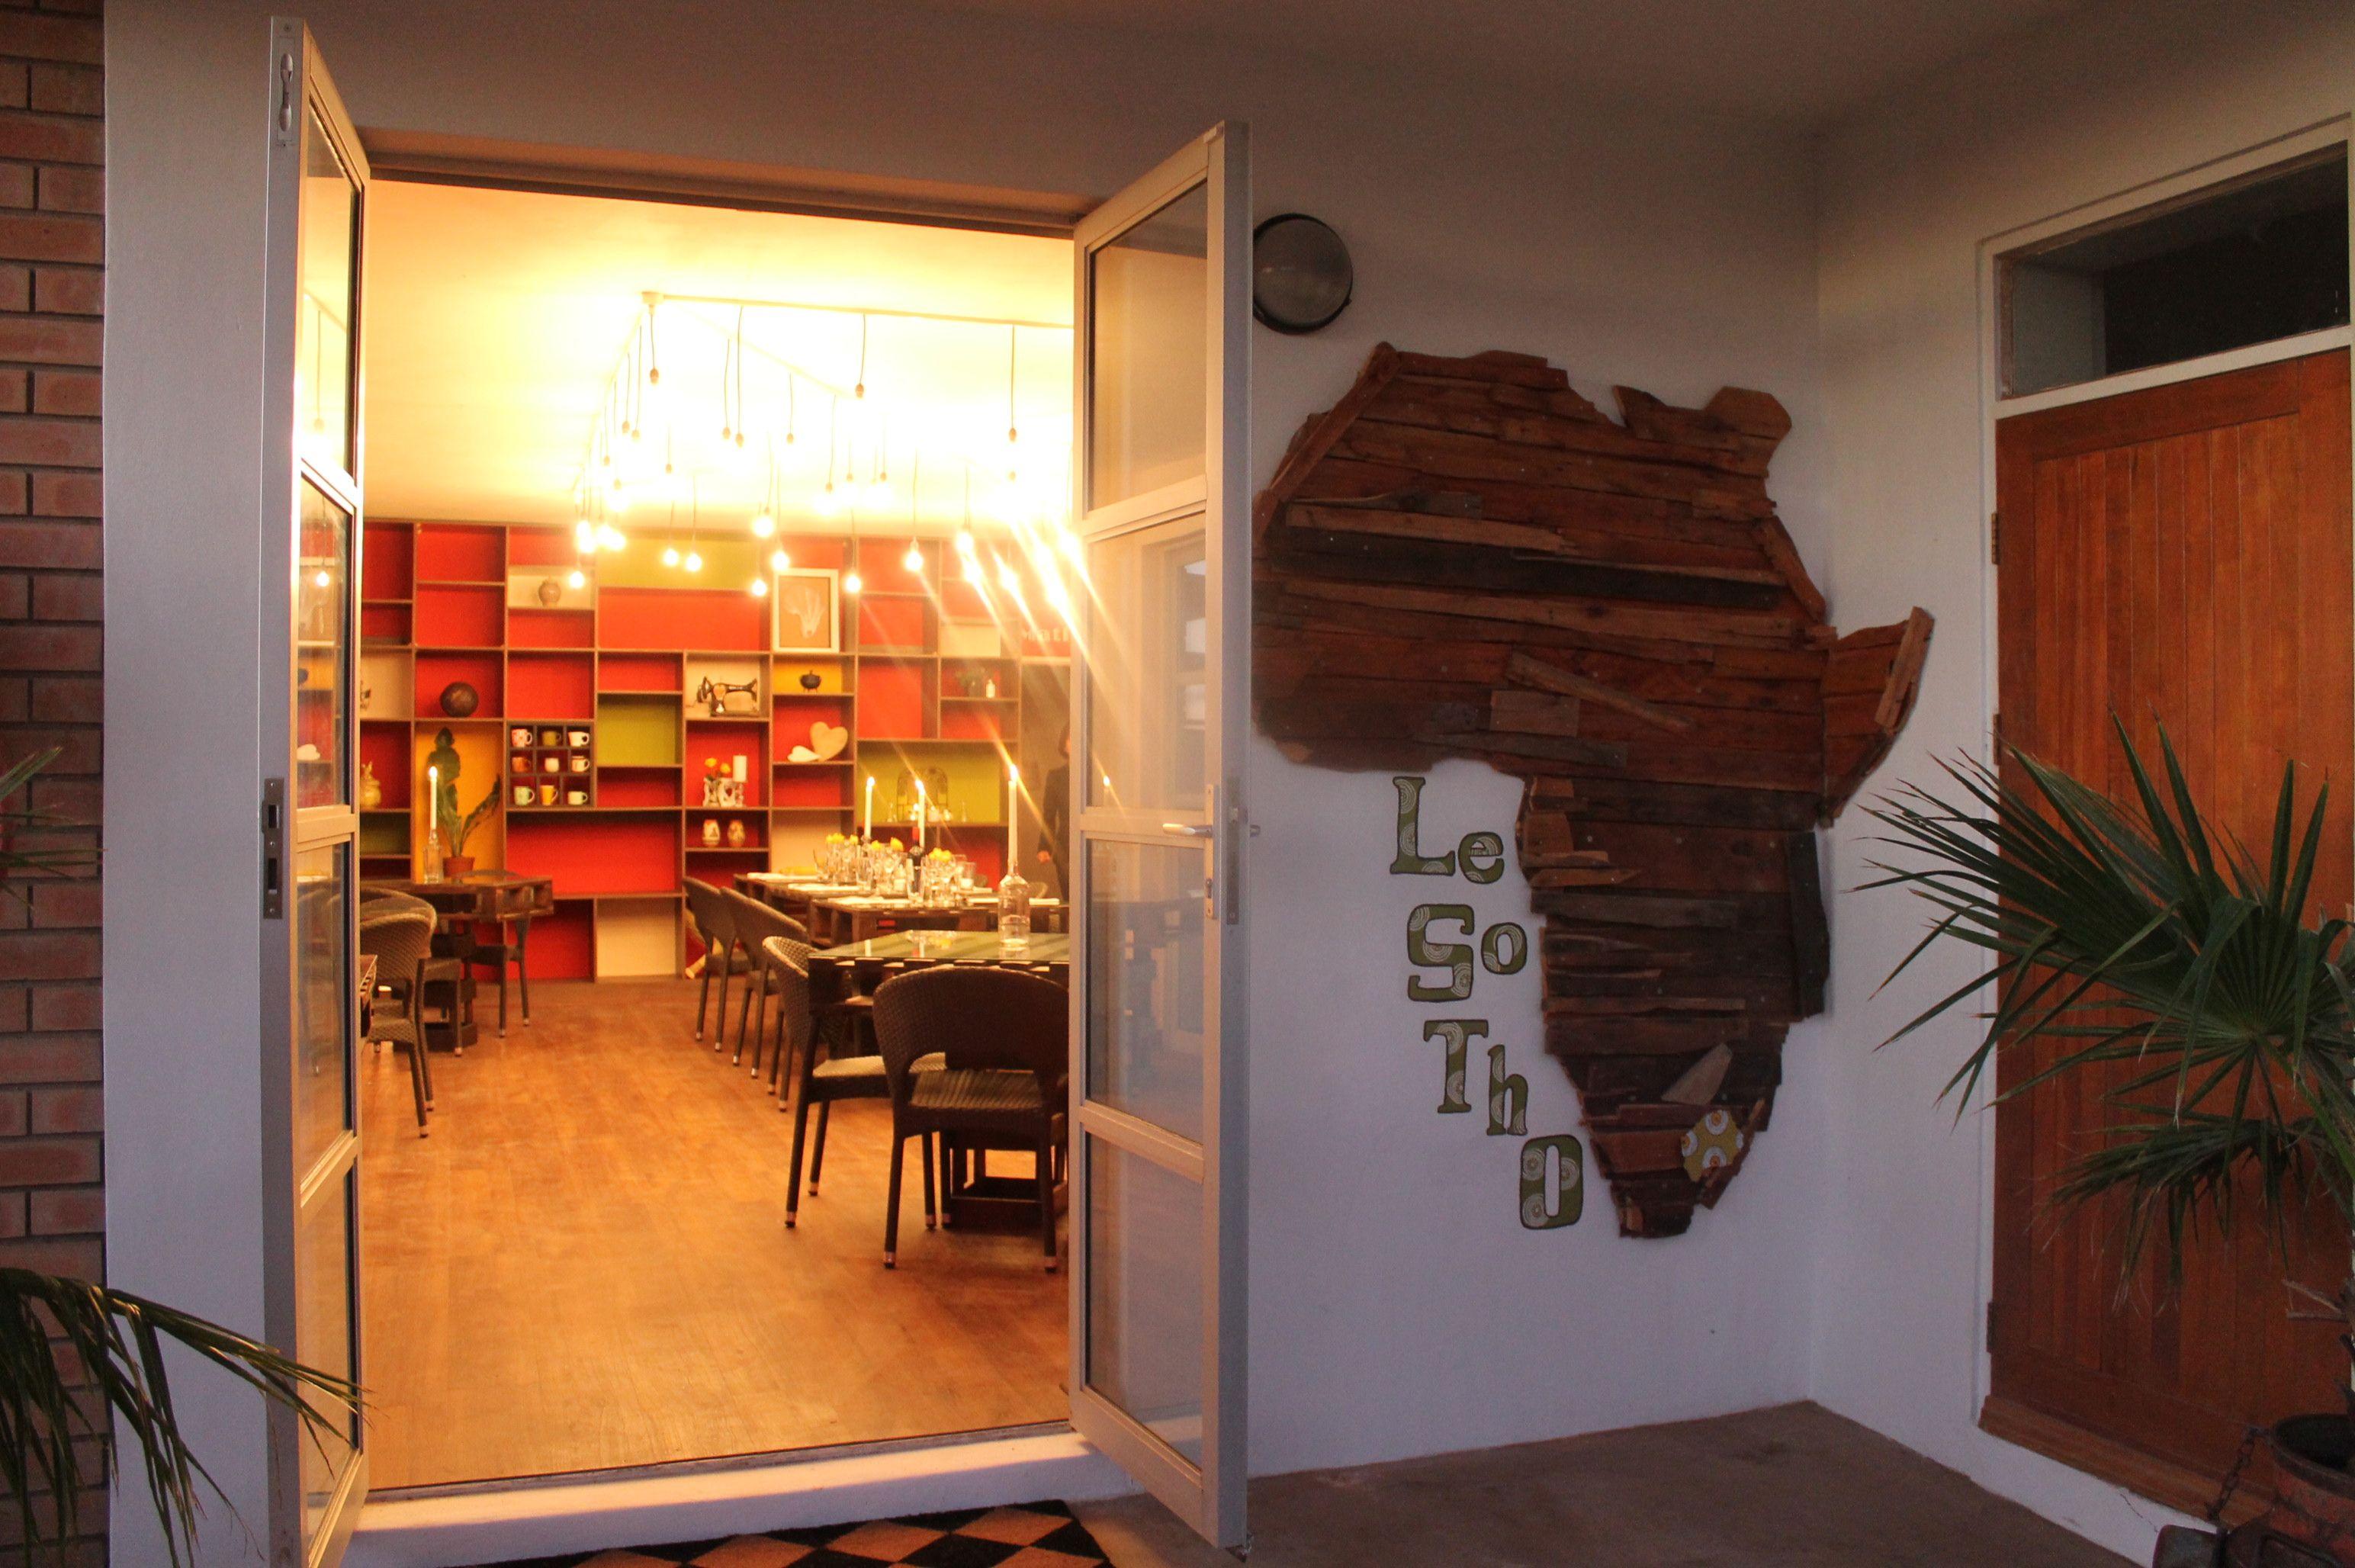 Xhosa wedding decor ideas  Front entrance  No Decor  Pinterest  Front entrances